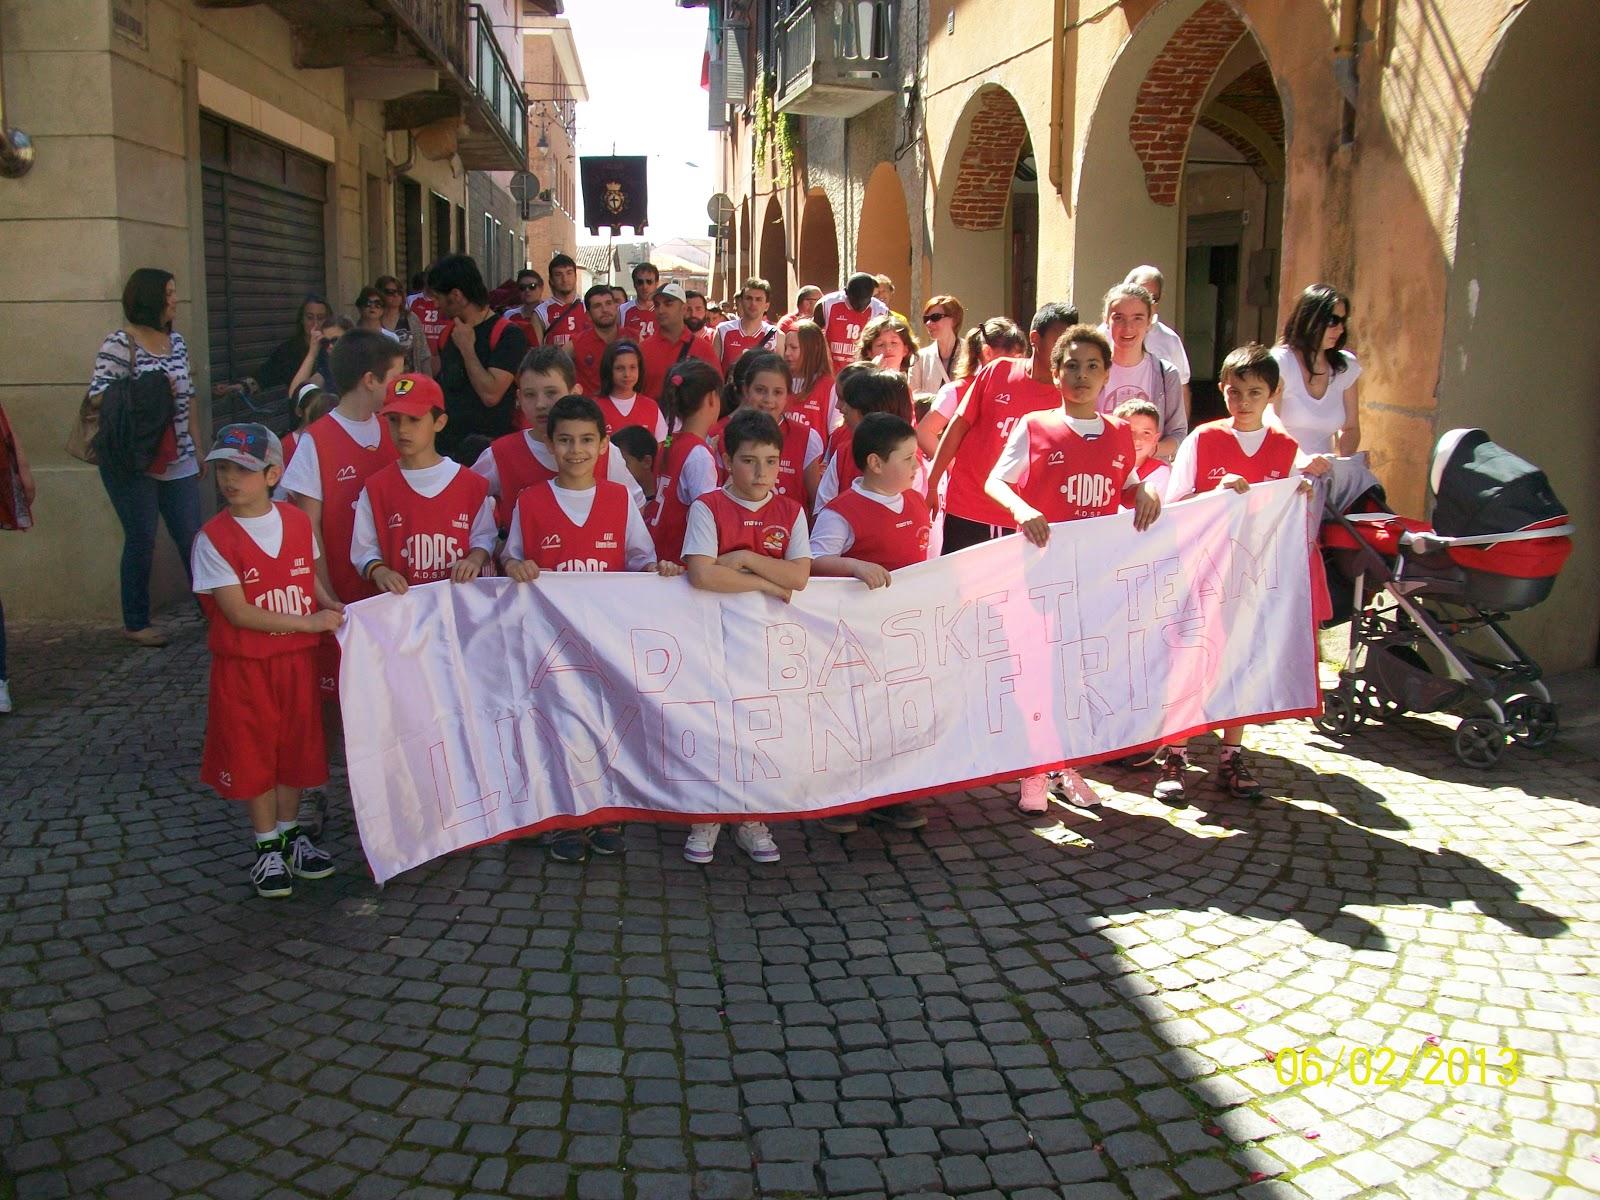 A.D.B.T. Livorno Ferraris: 2013